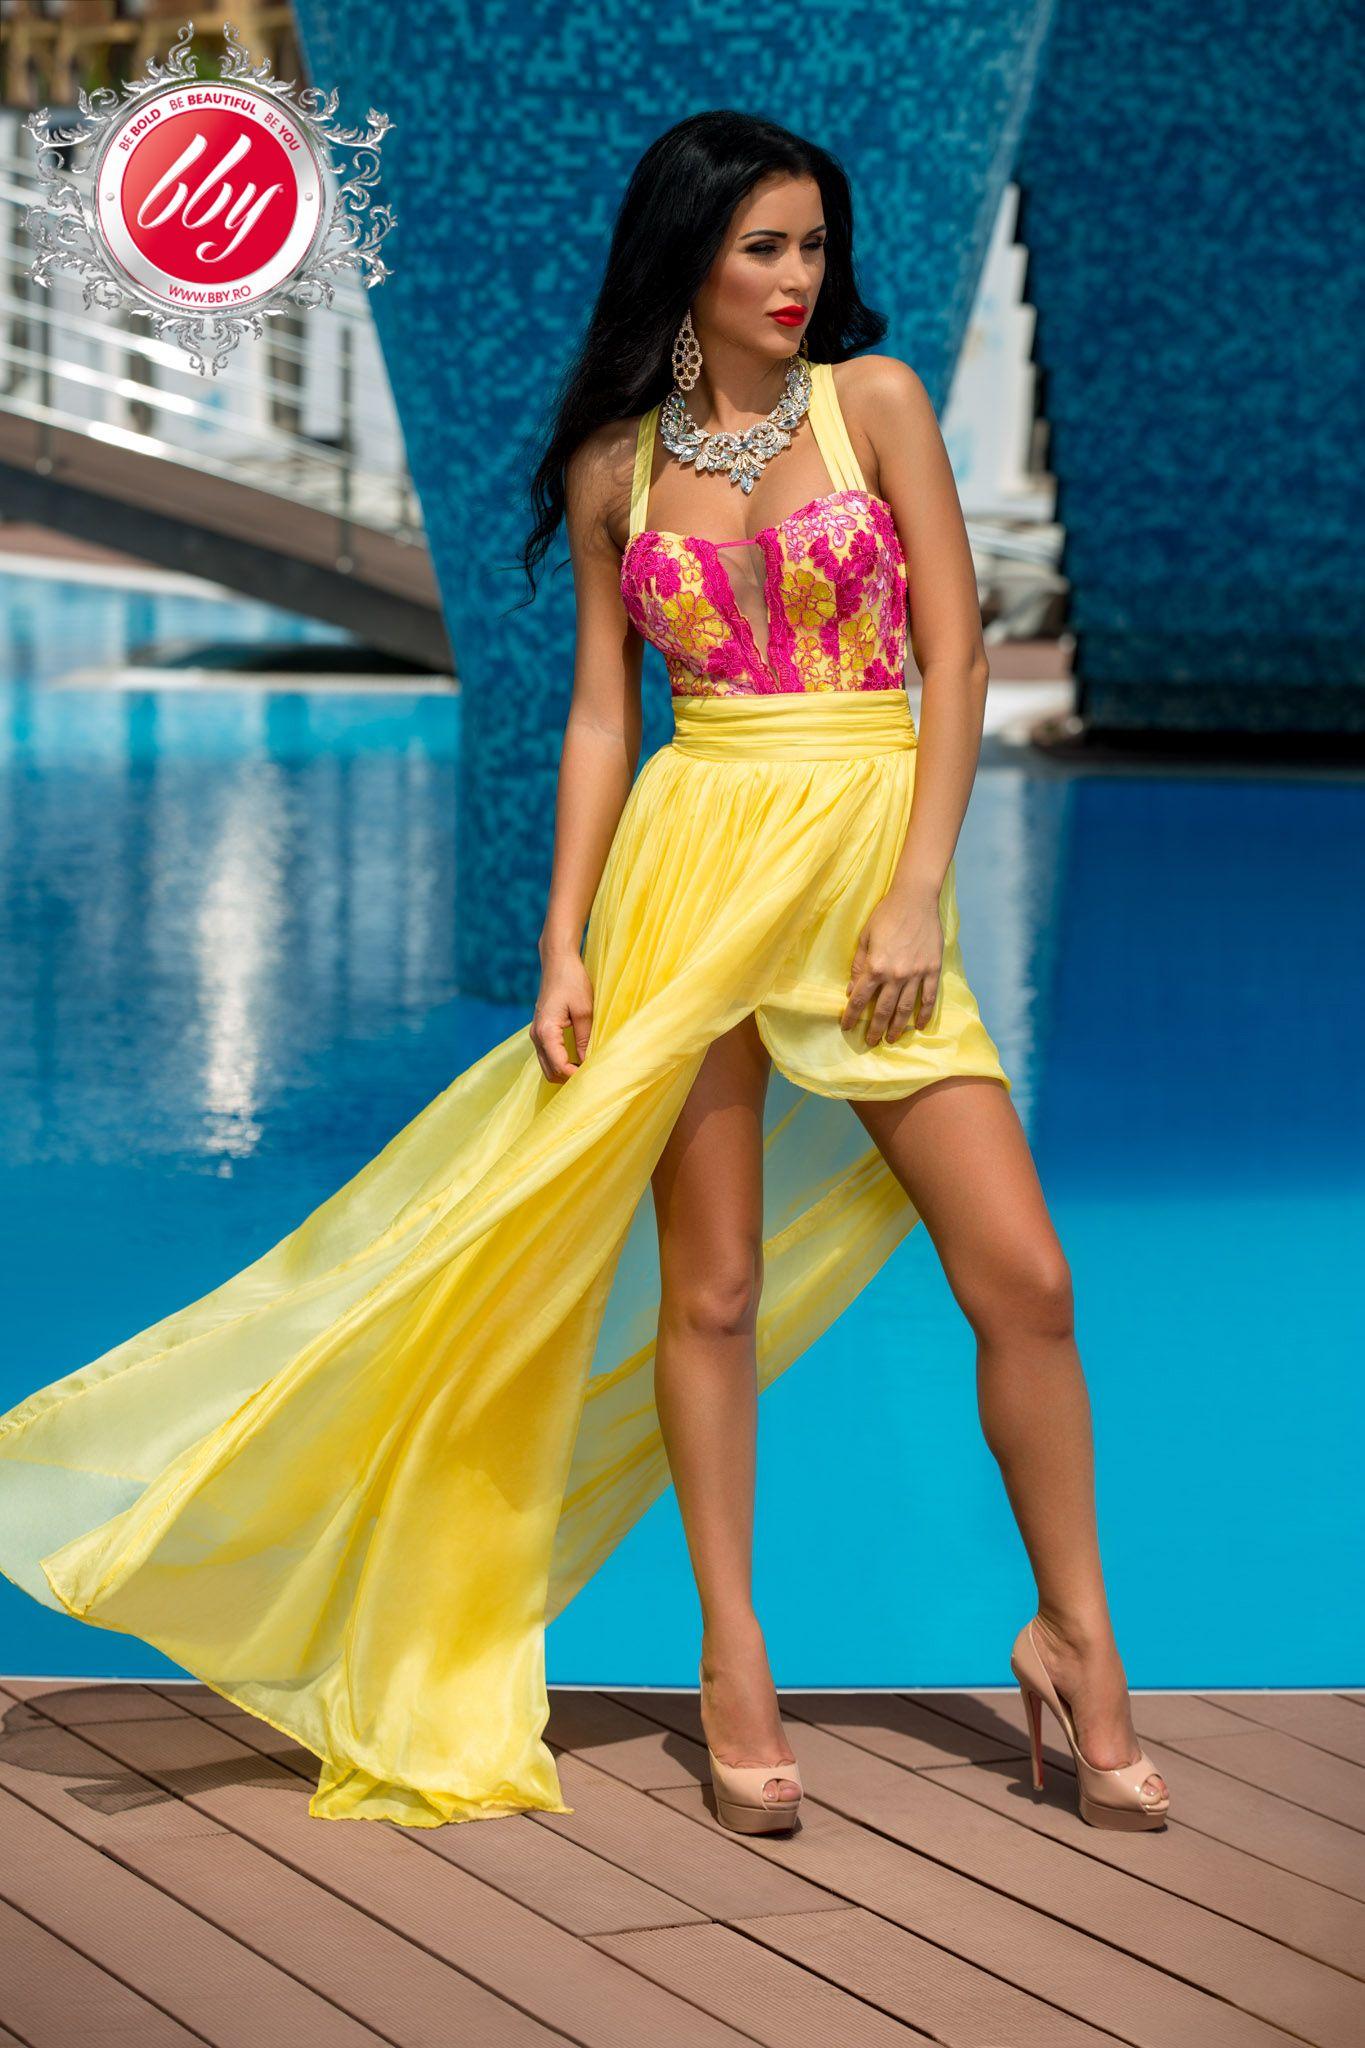 908ffd65f Fashion-up this summer! Love   Shop at www.bby.ro  BBYSummerDreams16 ...